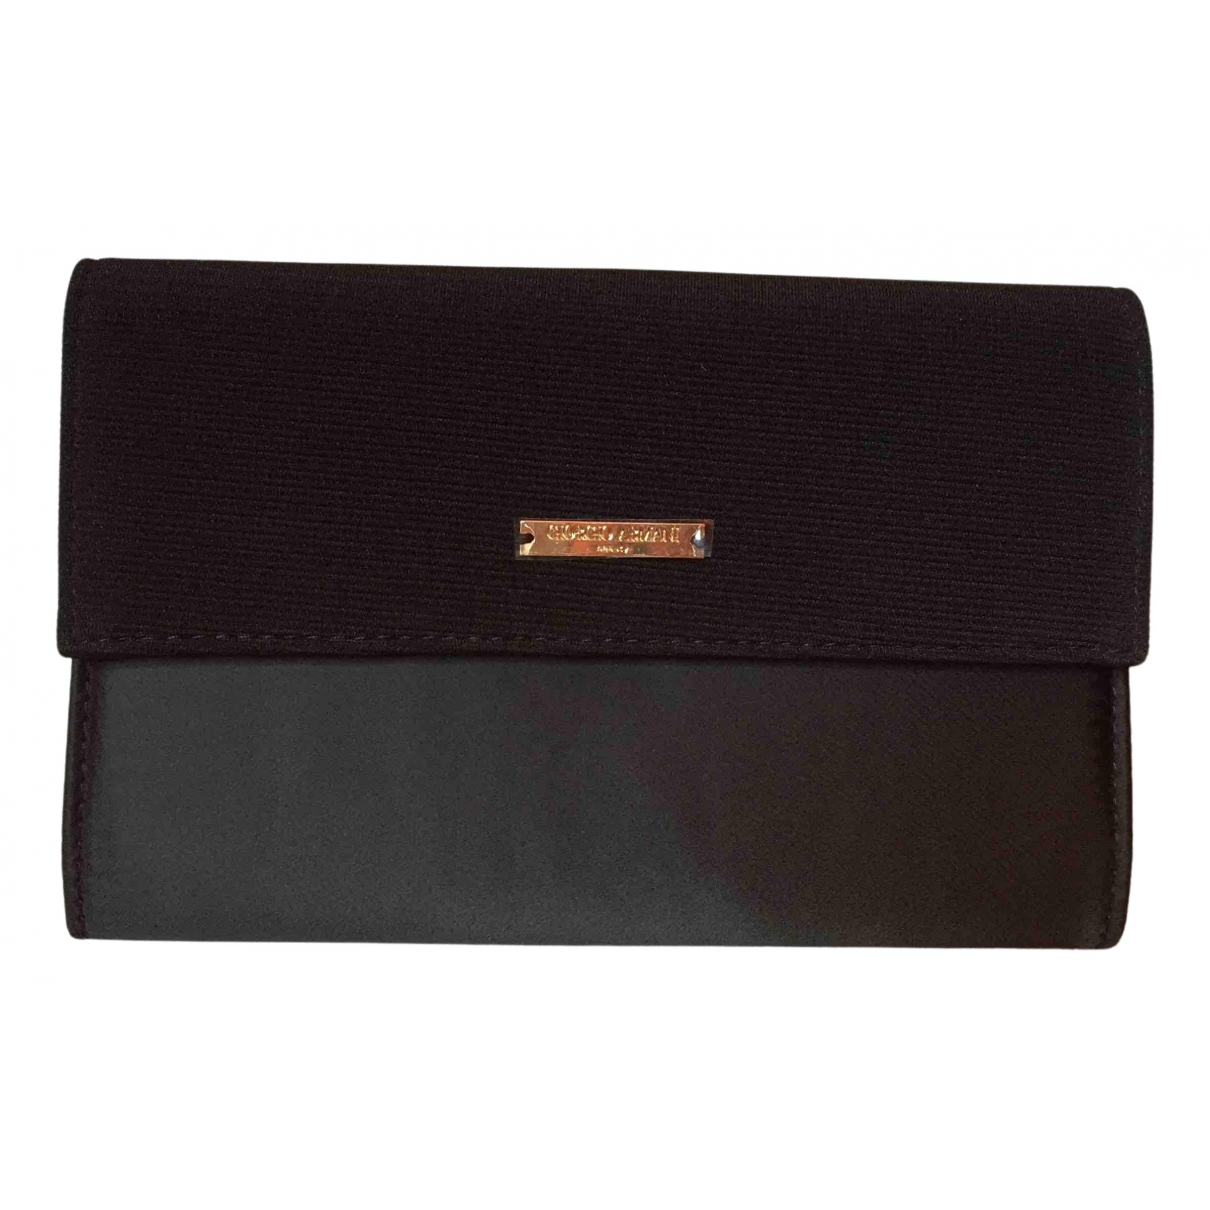 Giorgio Armani - Portefeuille   pour femme en toile - noir